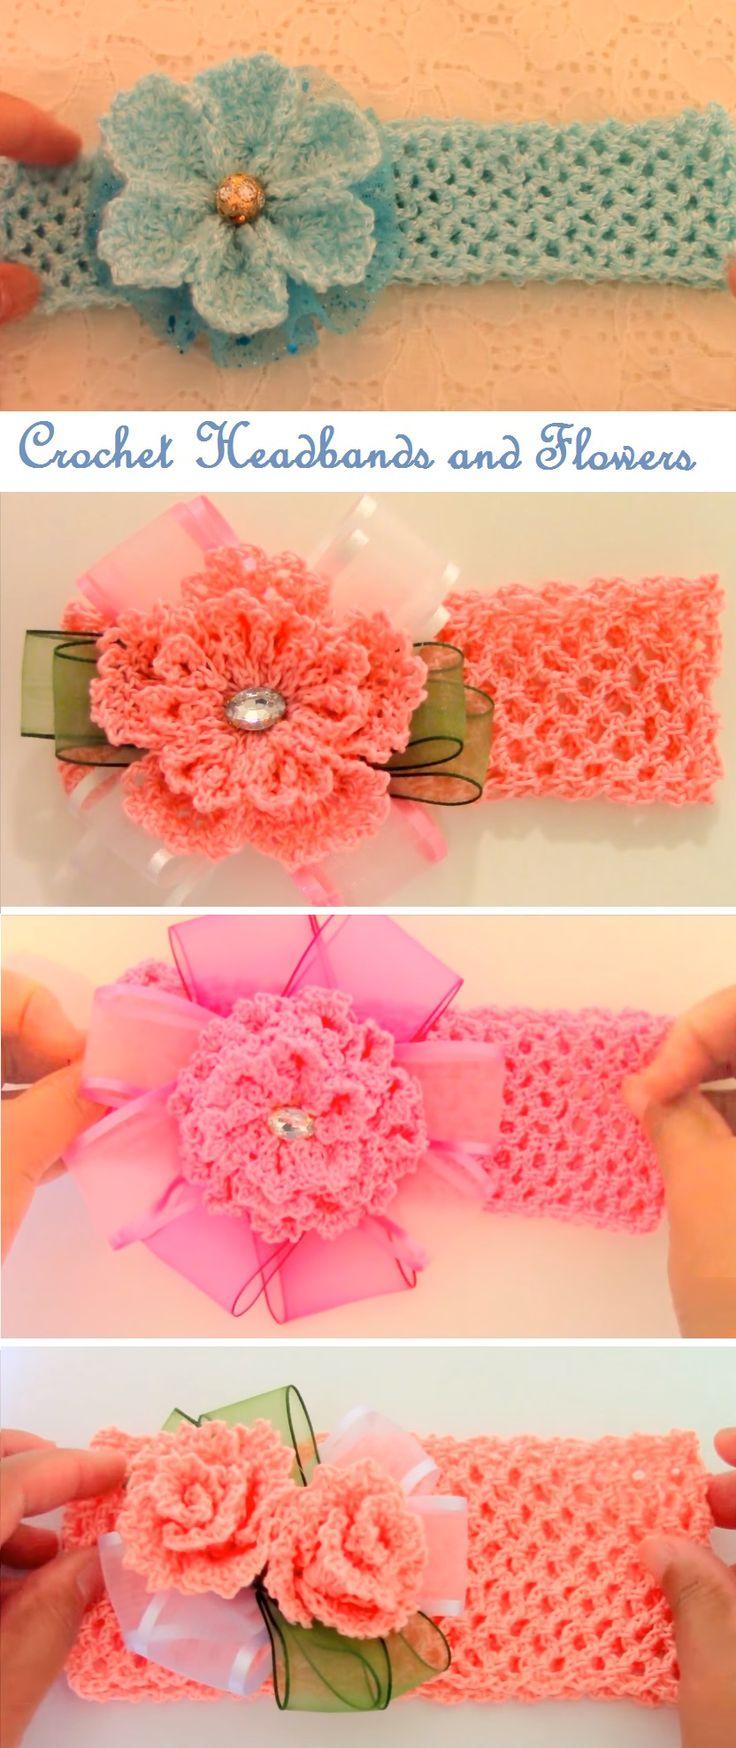 Crochet Headbands with Beautiful Flowers